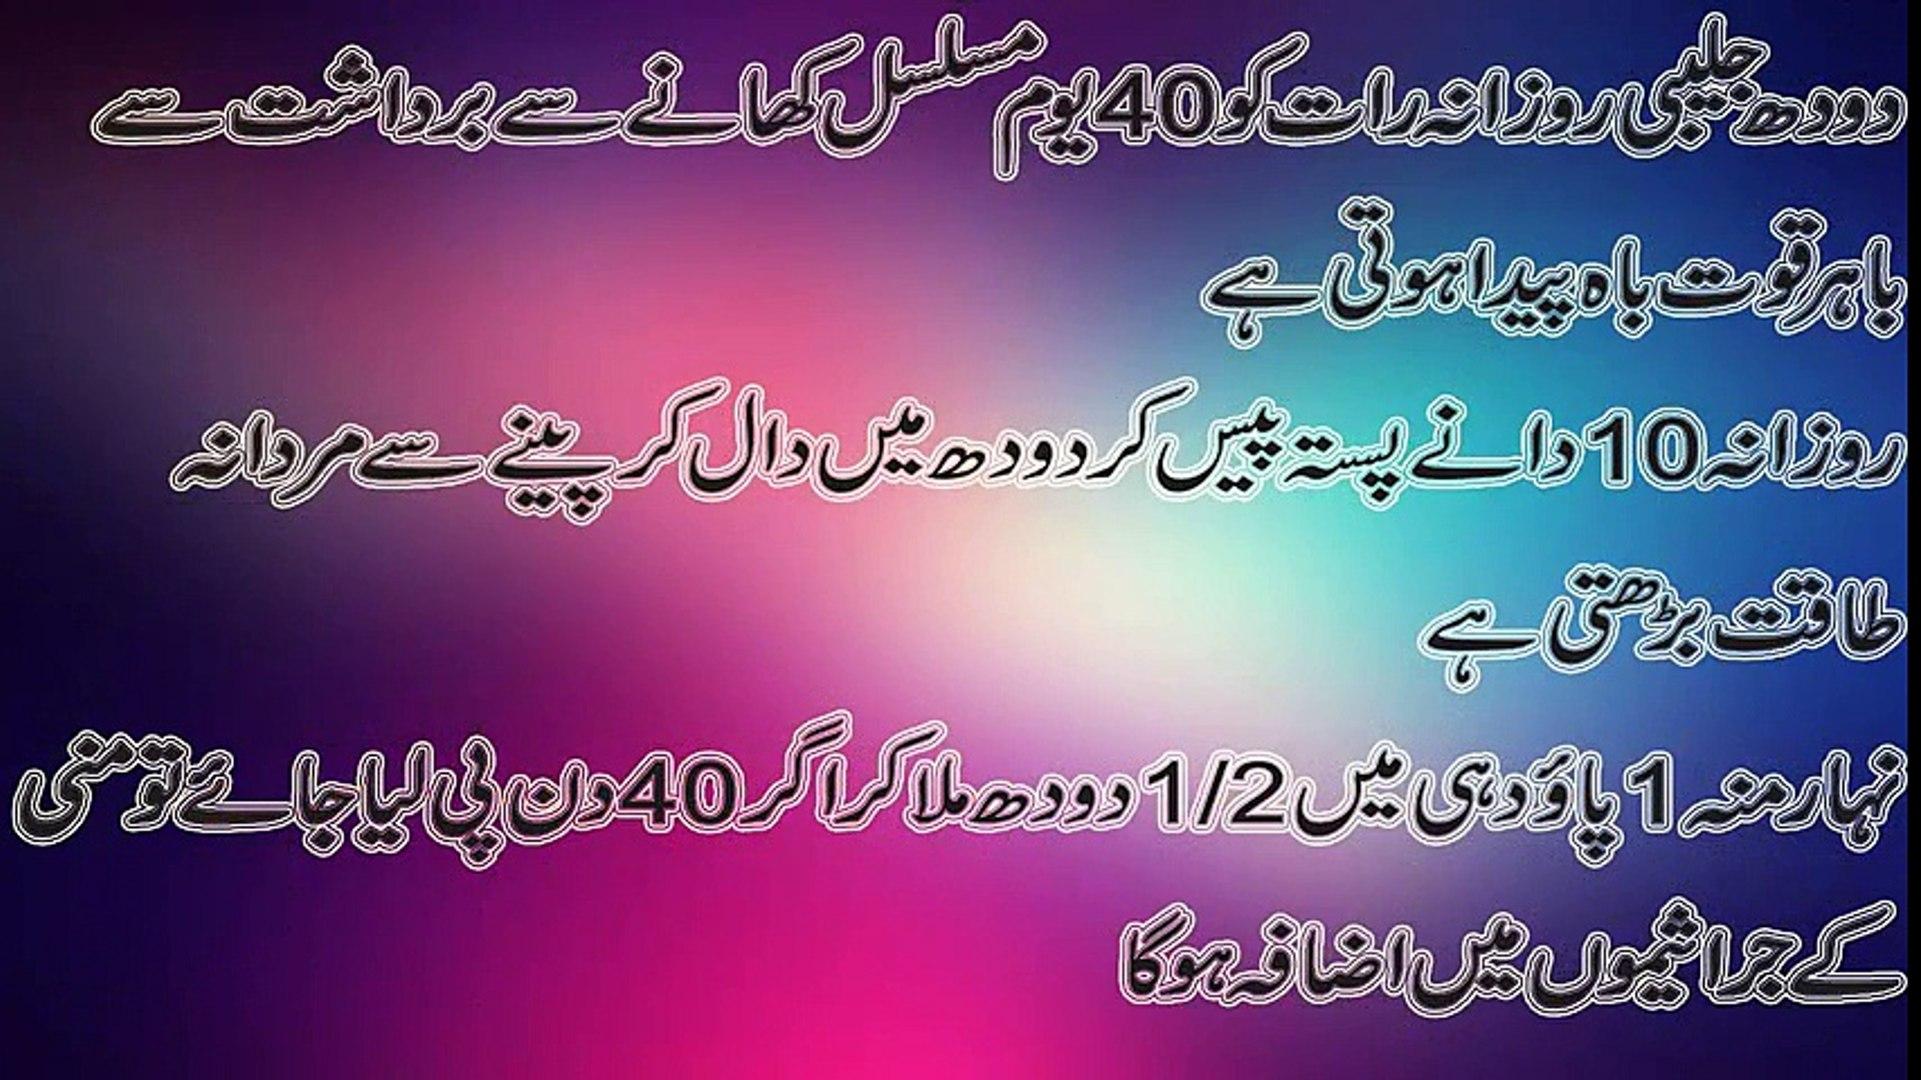 HEALTH TIPS IN URDU beauit tips in urdu men health tips